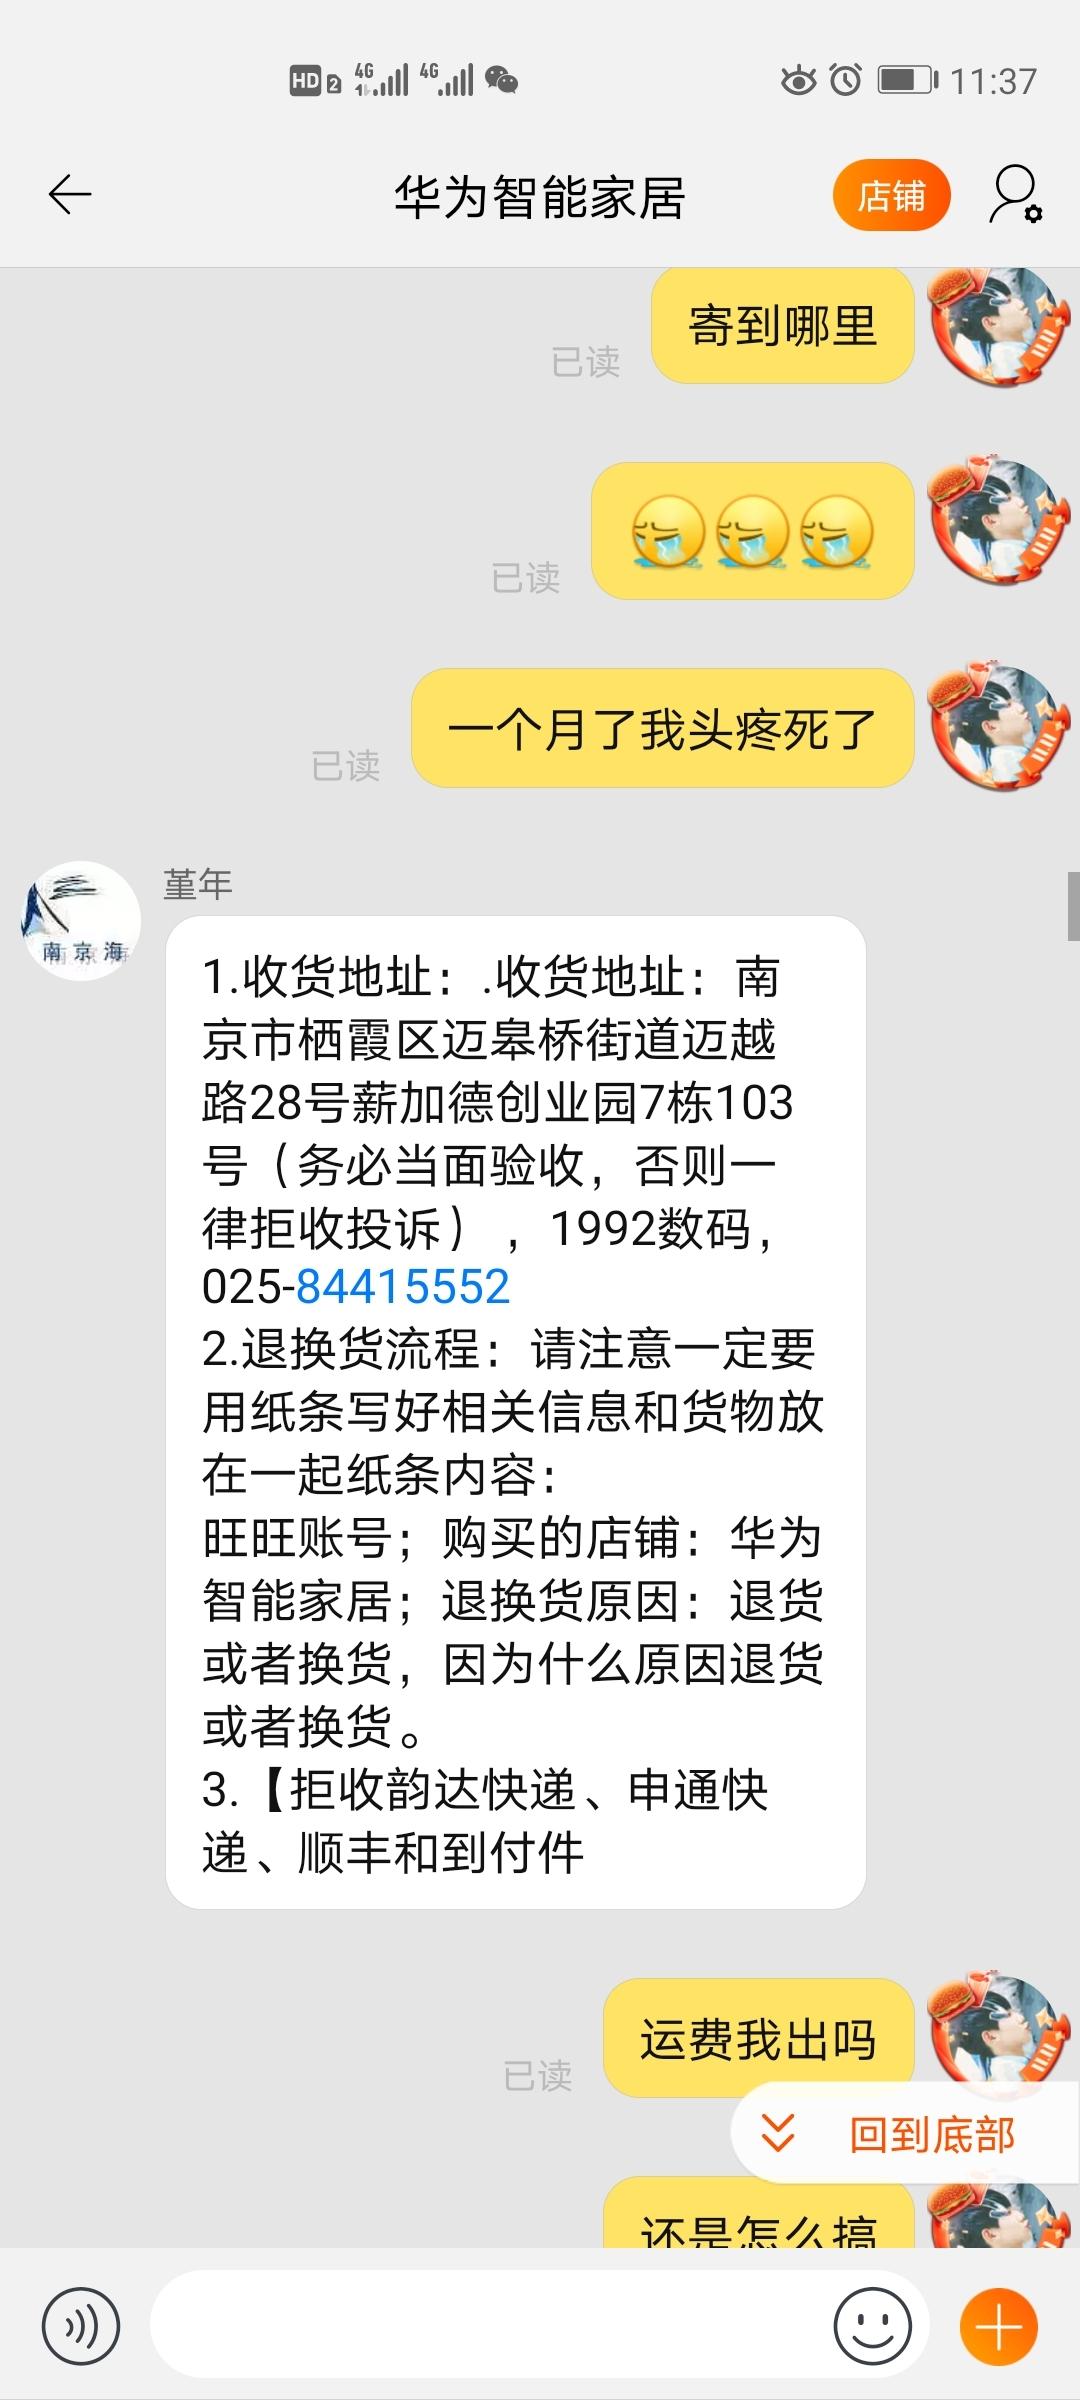 Screenshot_20200508_113731_com.taobao.taobao.jpg